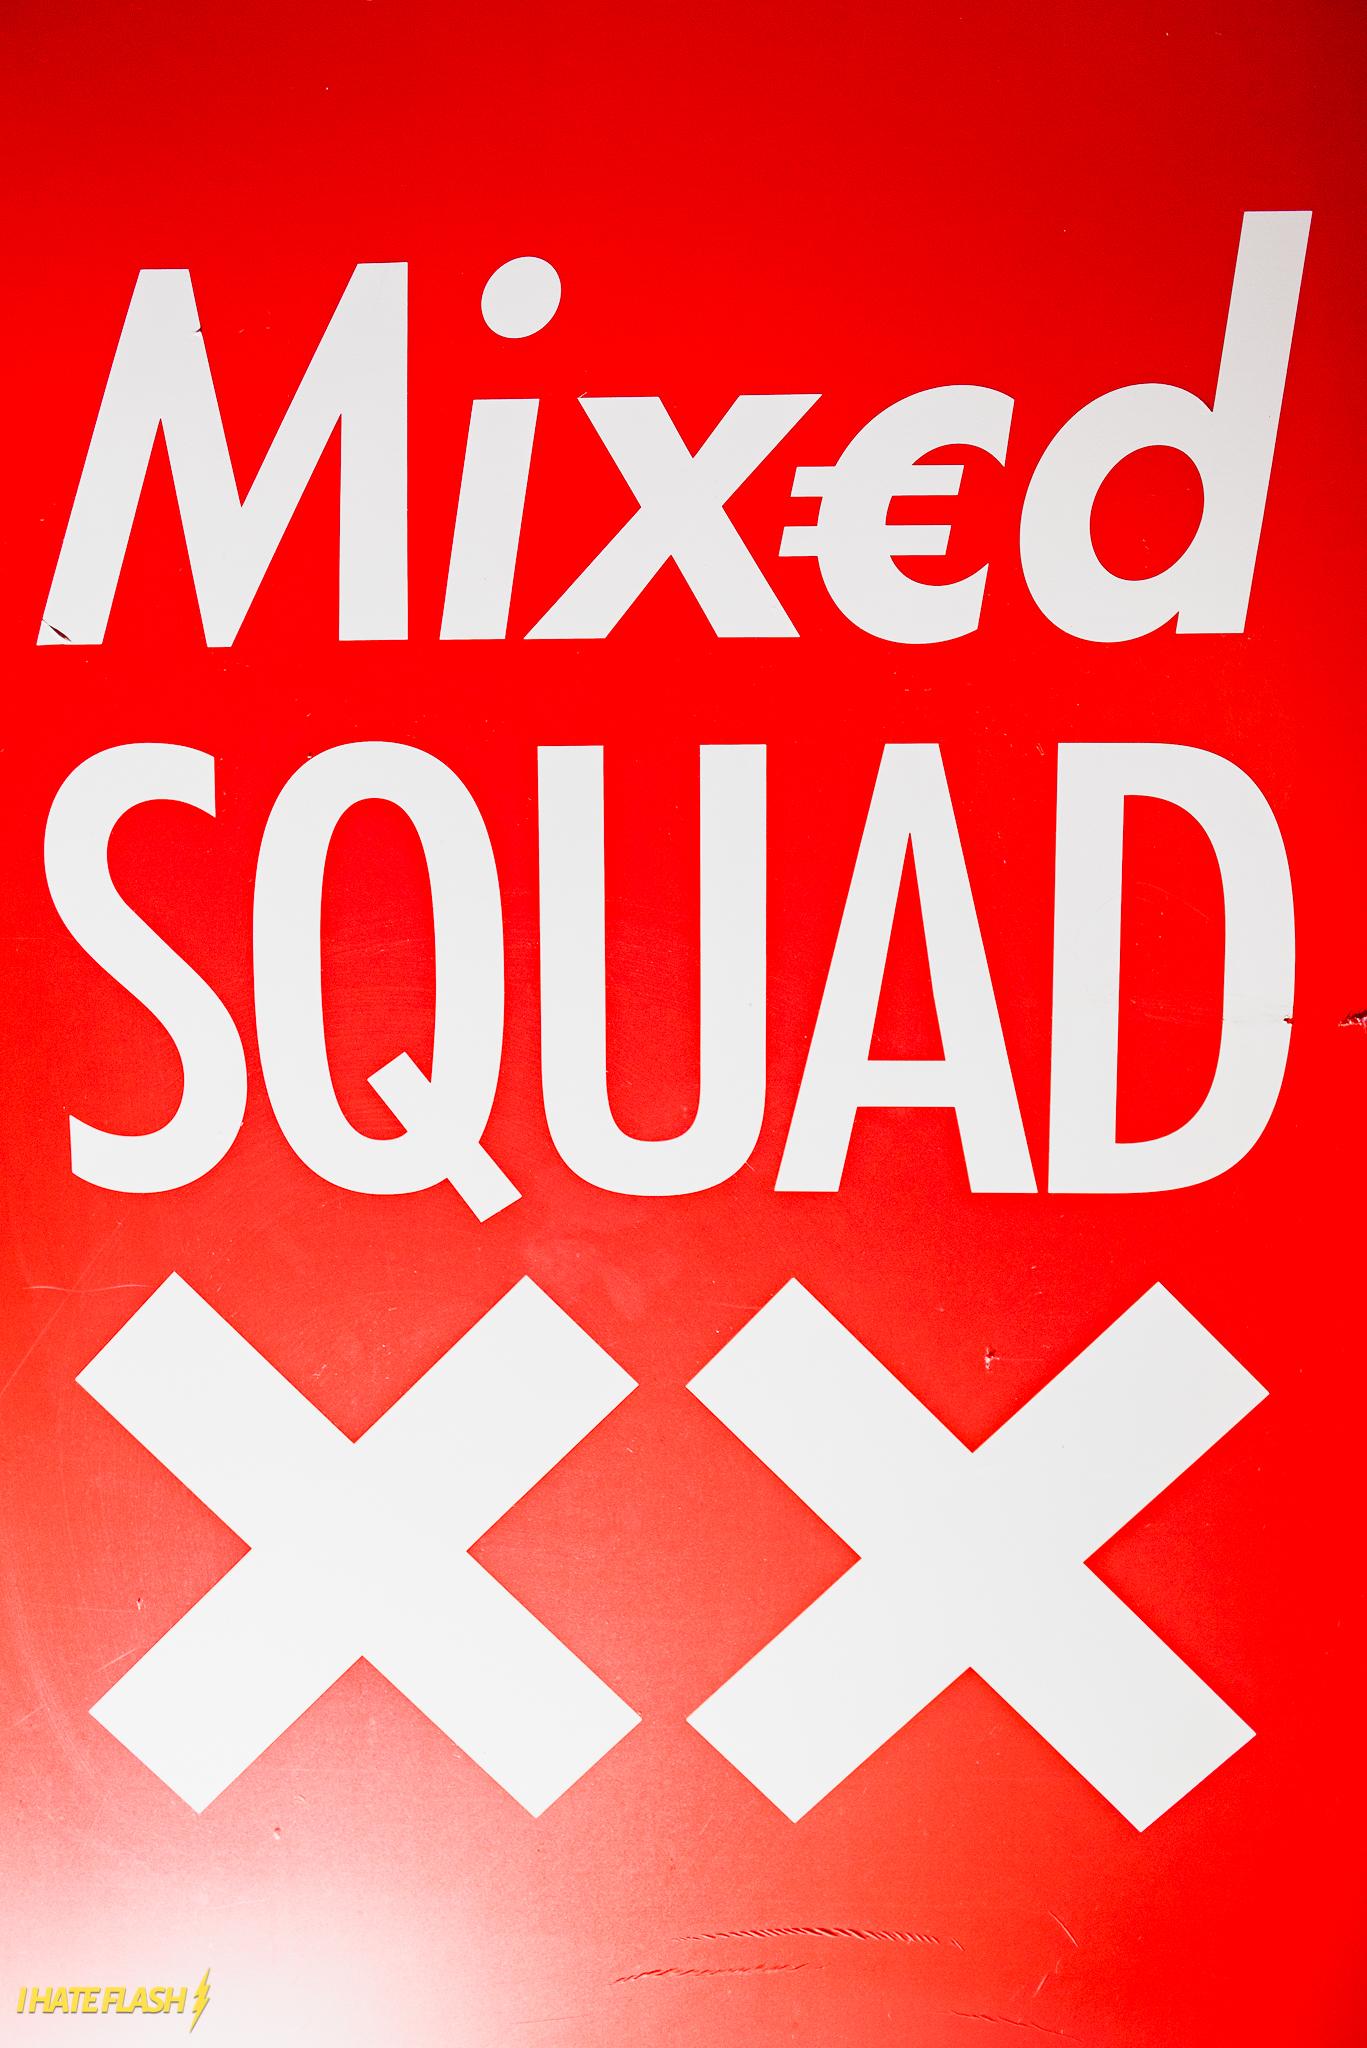 Mixed By Mixed